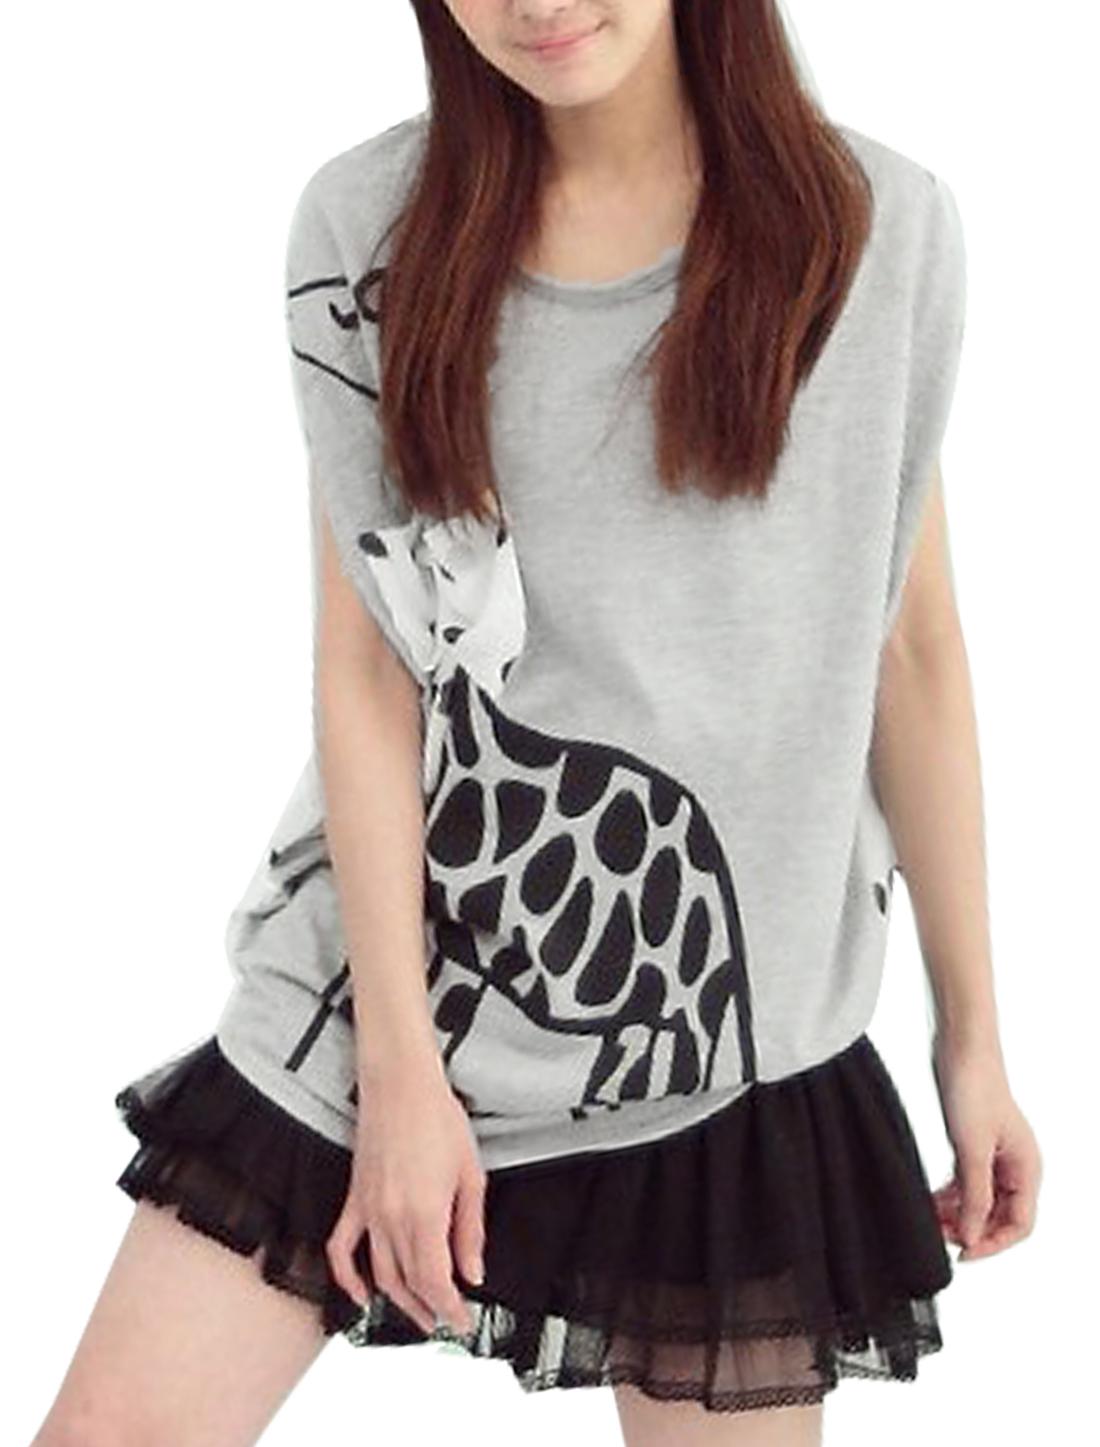 Lady Stylish Pullover Giraffe Pattern Light Gray Splice Top Shirt L